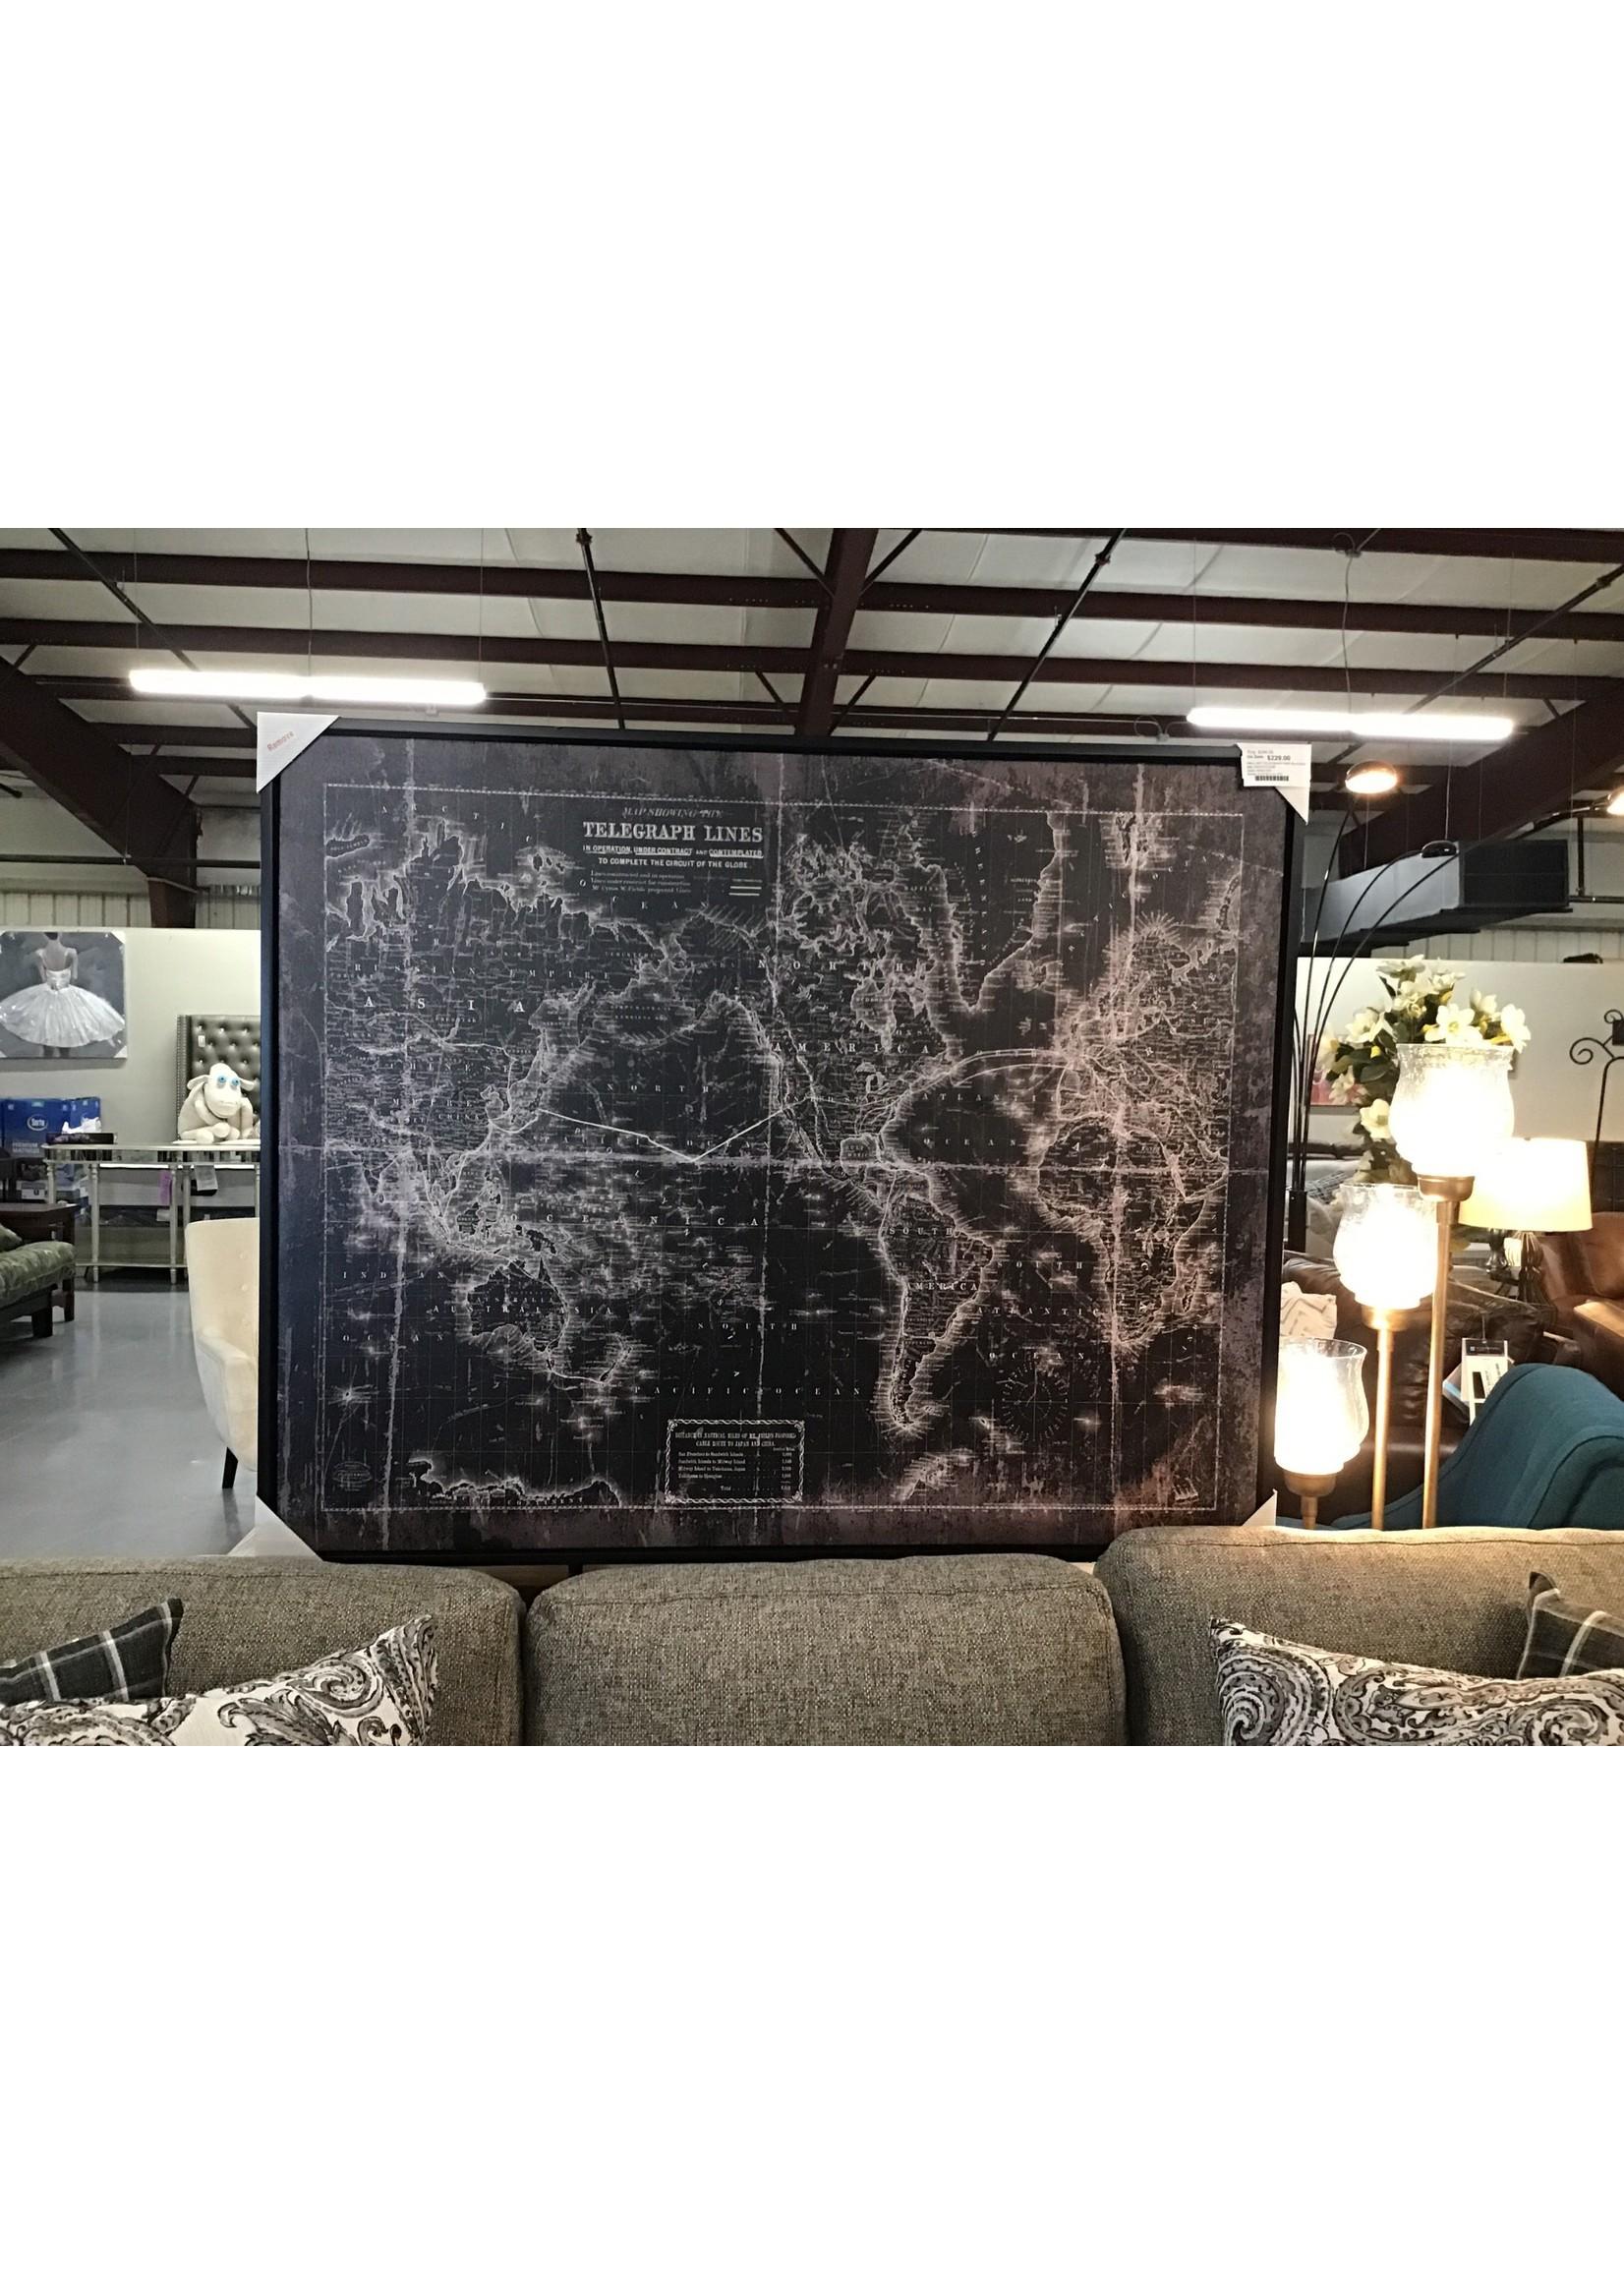 ASHLEY WALL ART TELEGRAPH MAP BLACK/WHITE